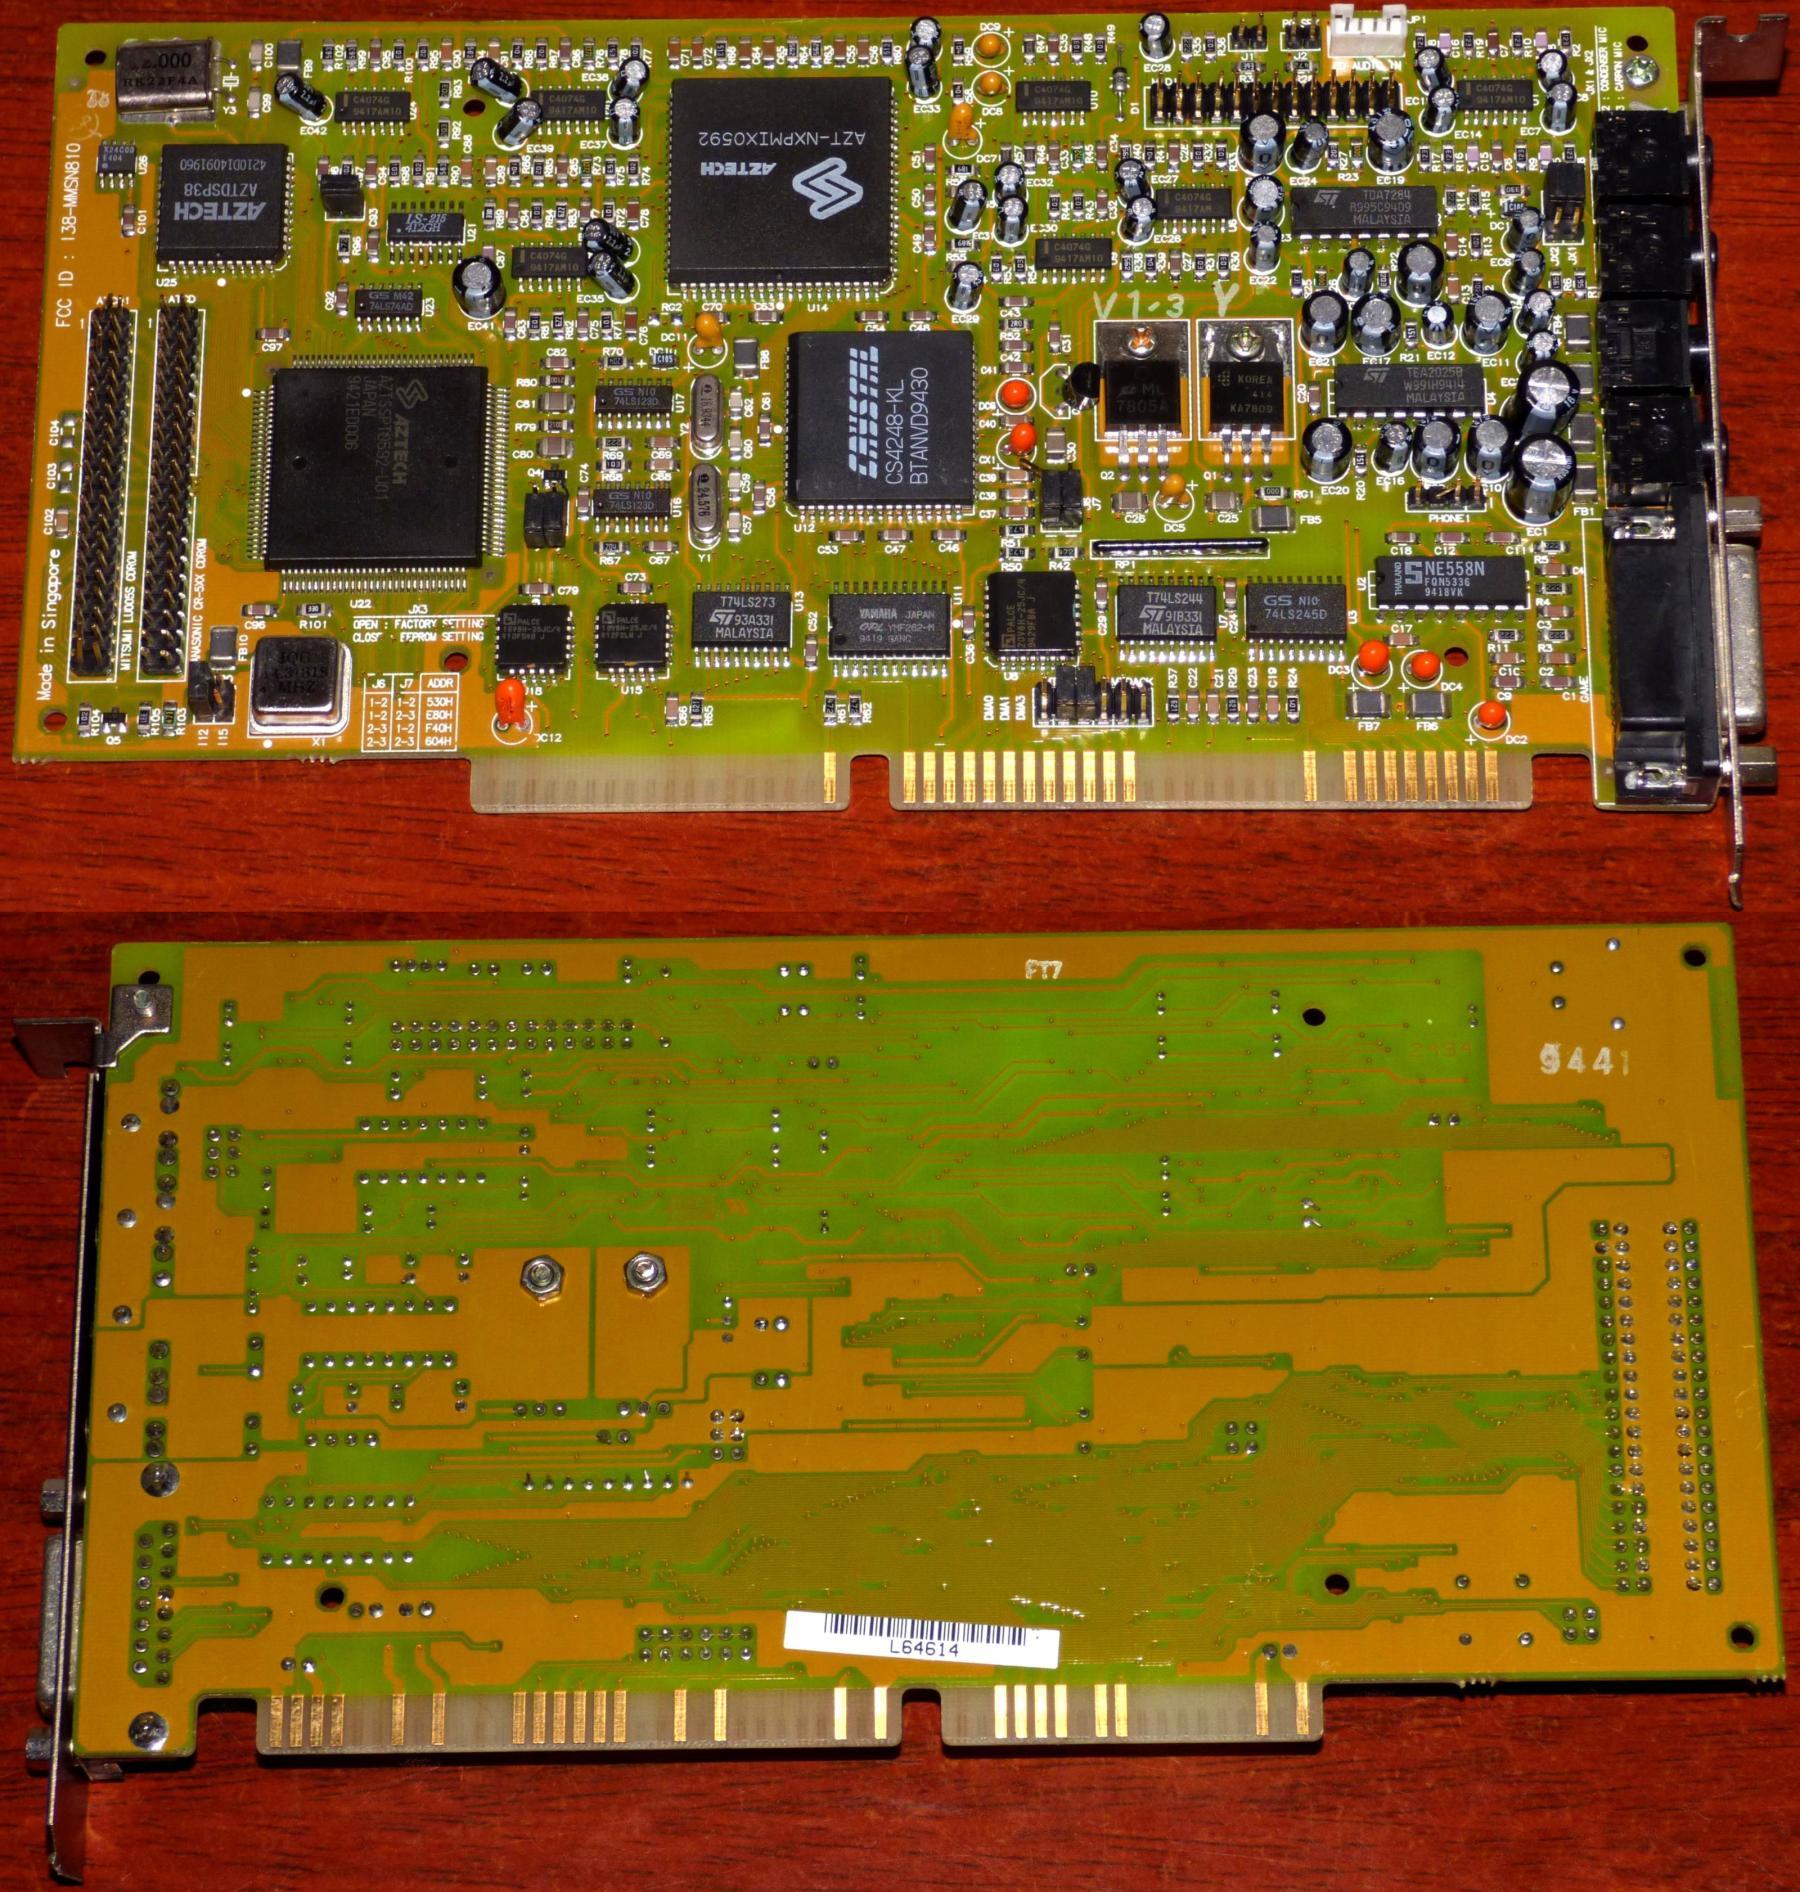 Aztech-Sound-Galaxy-Basic-16-FCC-ID-138-MMSN810-Crystal-CS4248-KL-AZT-NXPMIX0592-AZTDSP38-AZTSSPT0592-U01-Yamaha-OP-YMF262-M-Mitsumi-LU005S-Panasonic-CR-5XX-CDROM-Interface-ISA-Singapore-1994.jpg